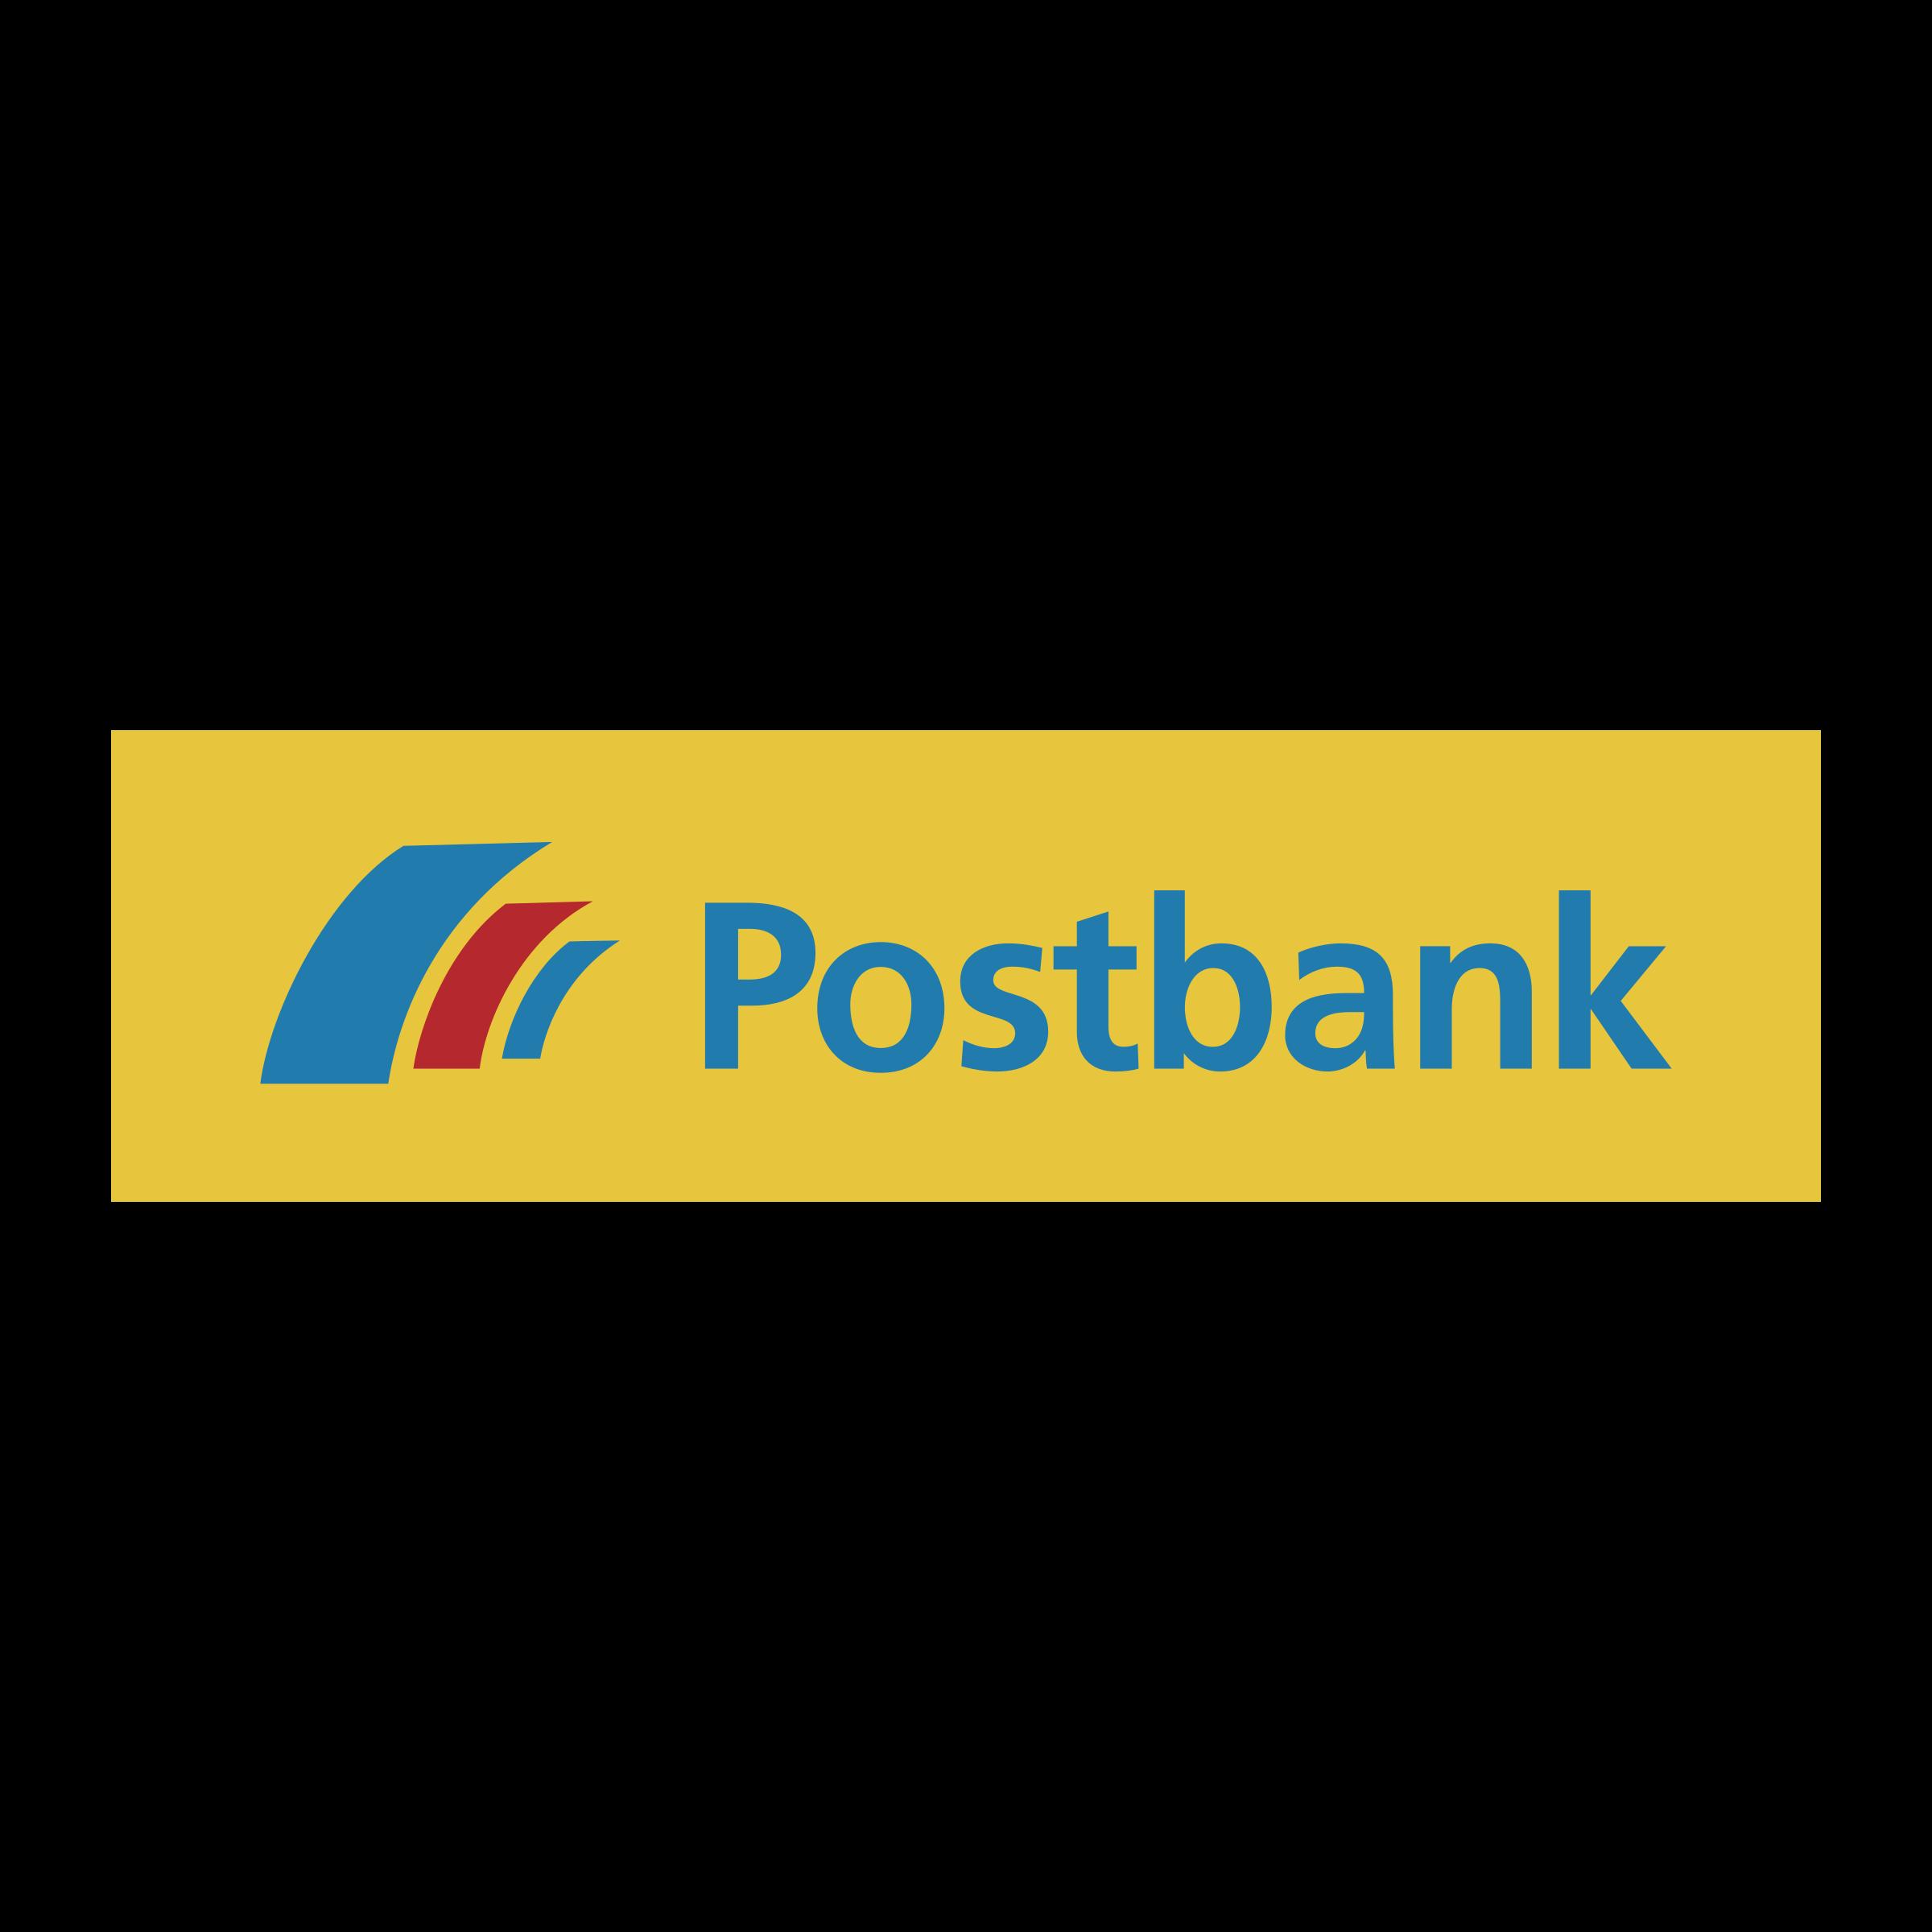 Postbank Logo PNG Transparent & SVG Vector.